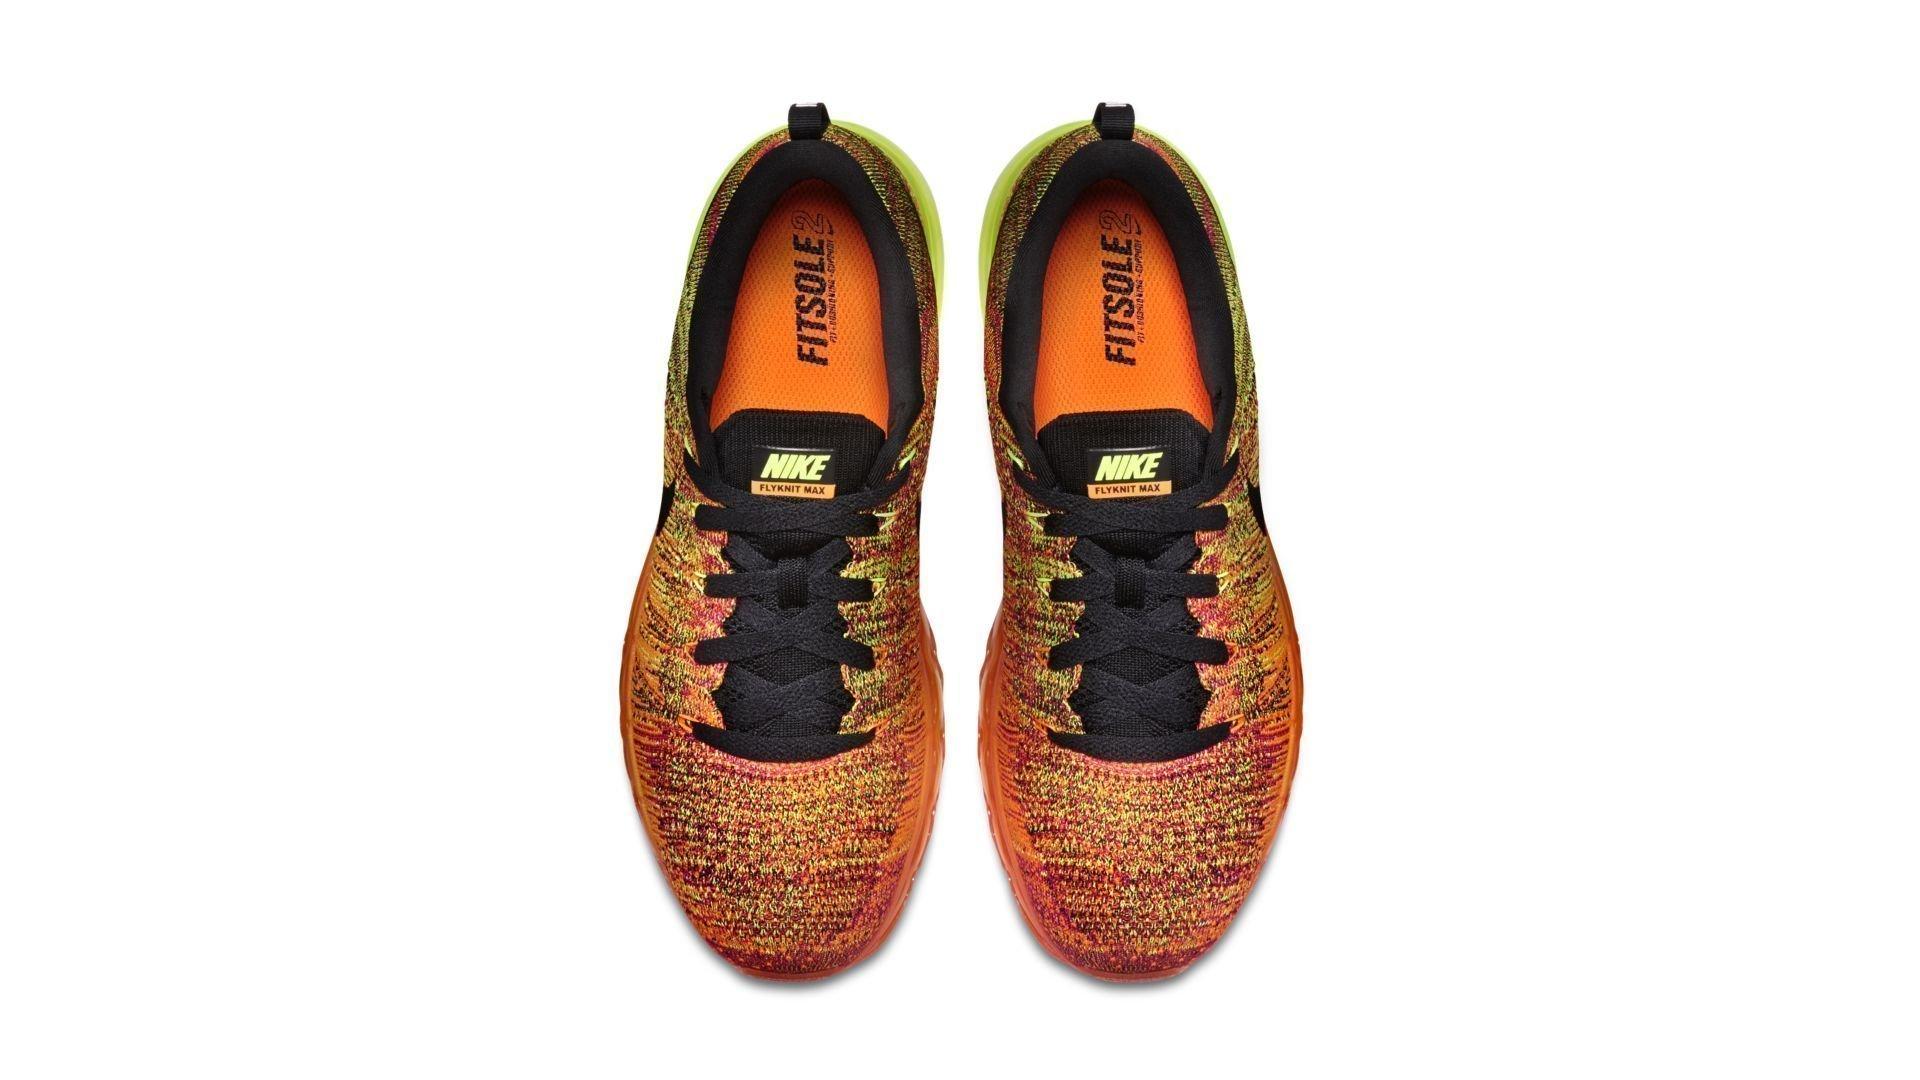 Nike Flyknit Max Total Orange Fireberry (620469-801)